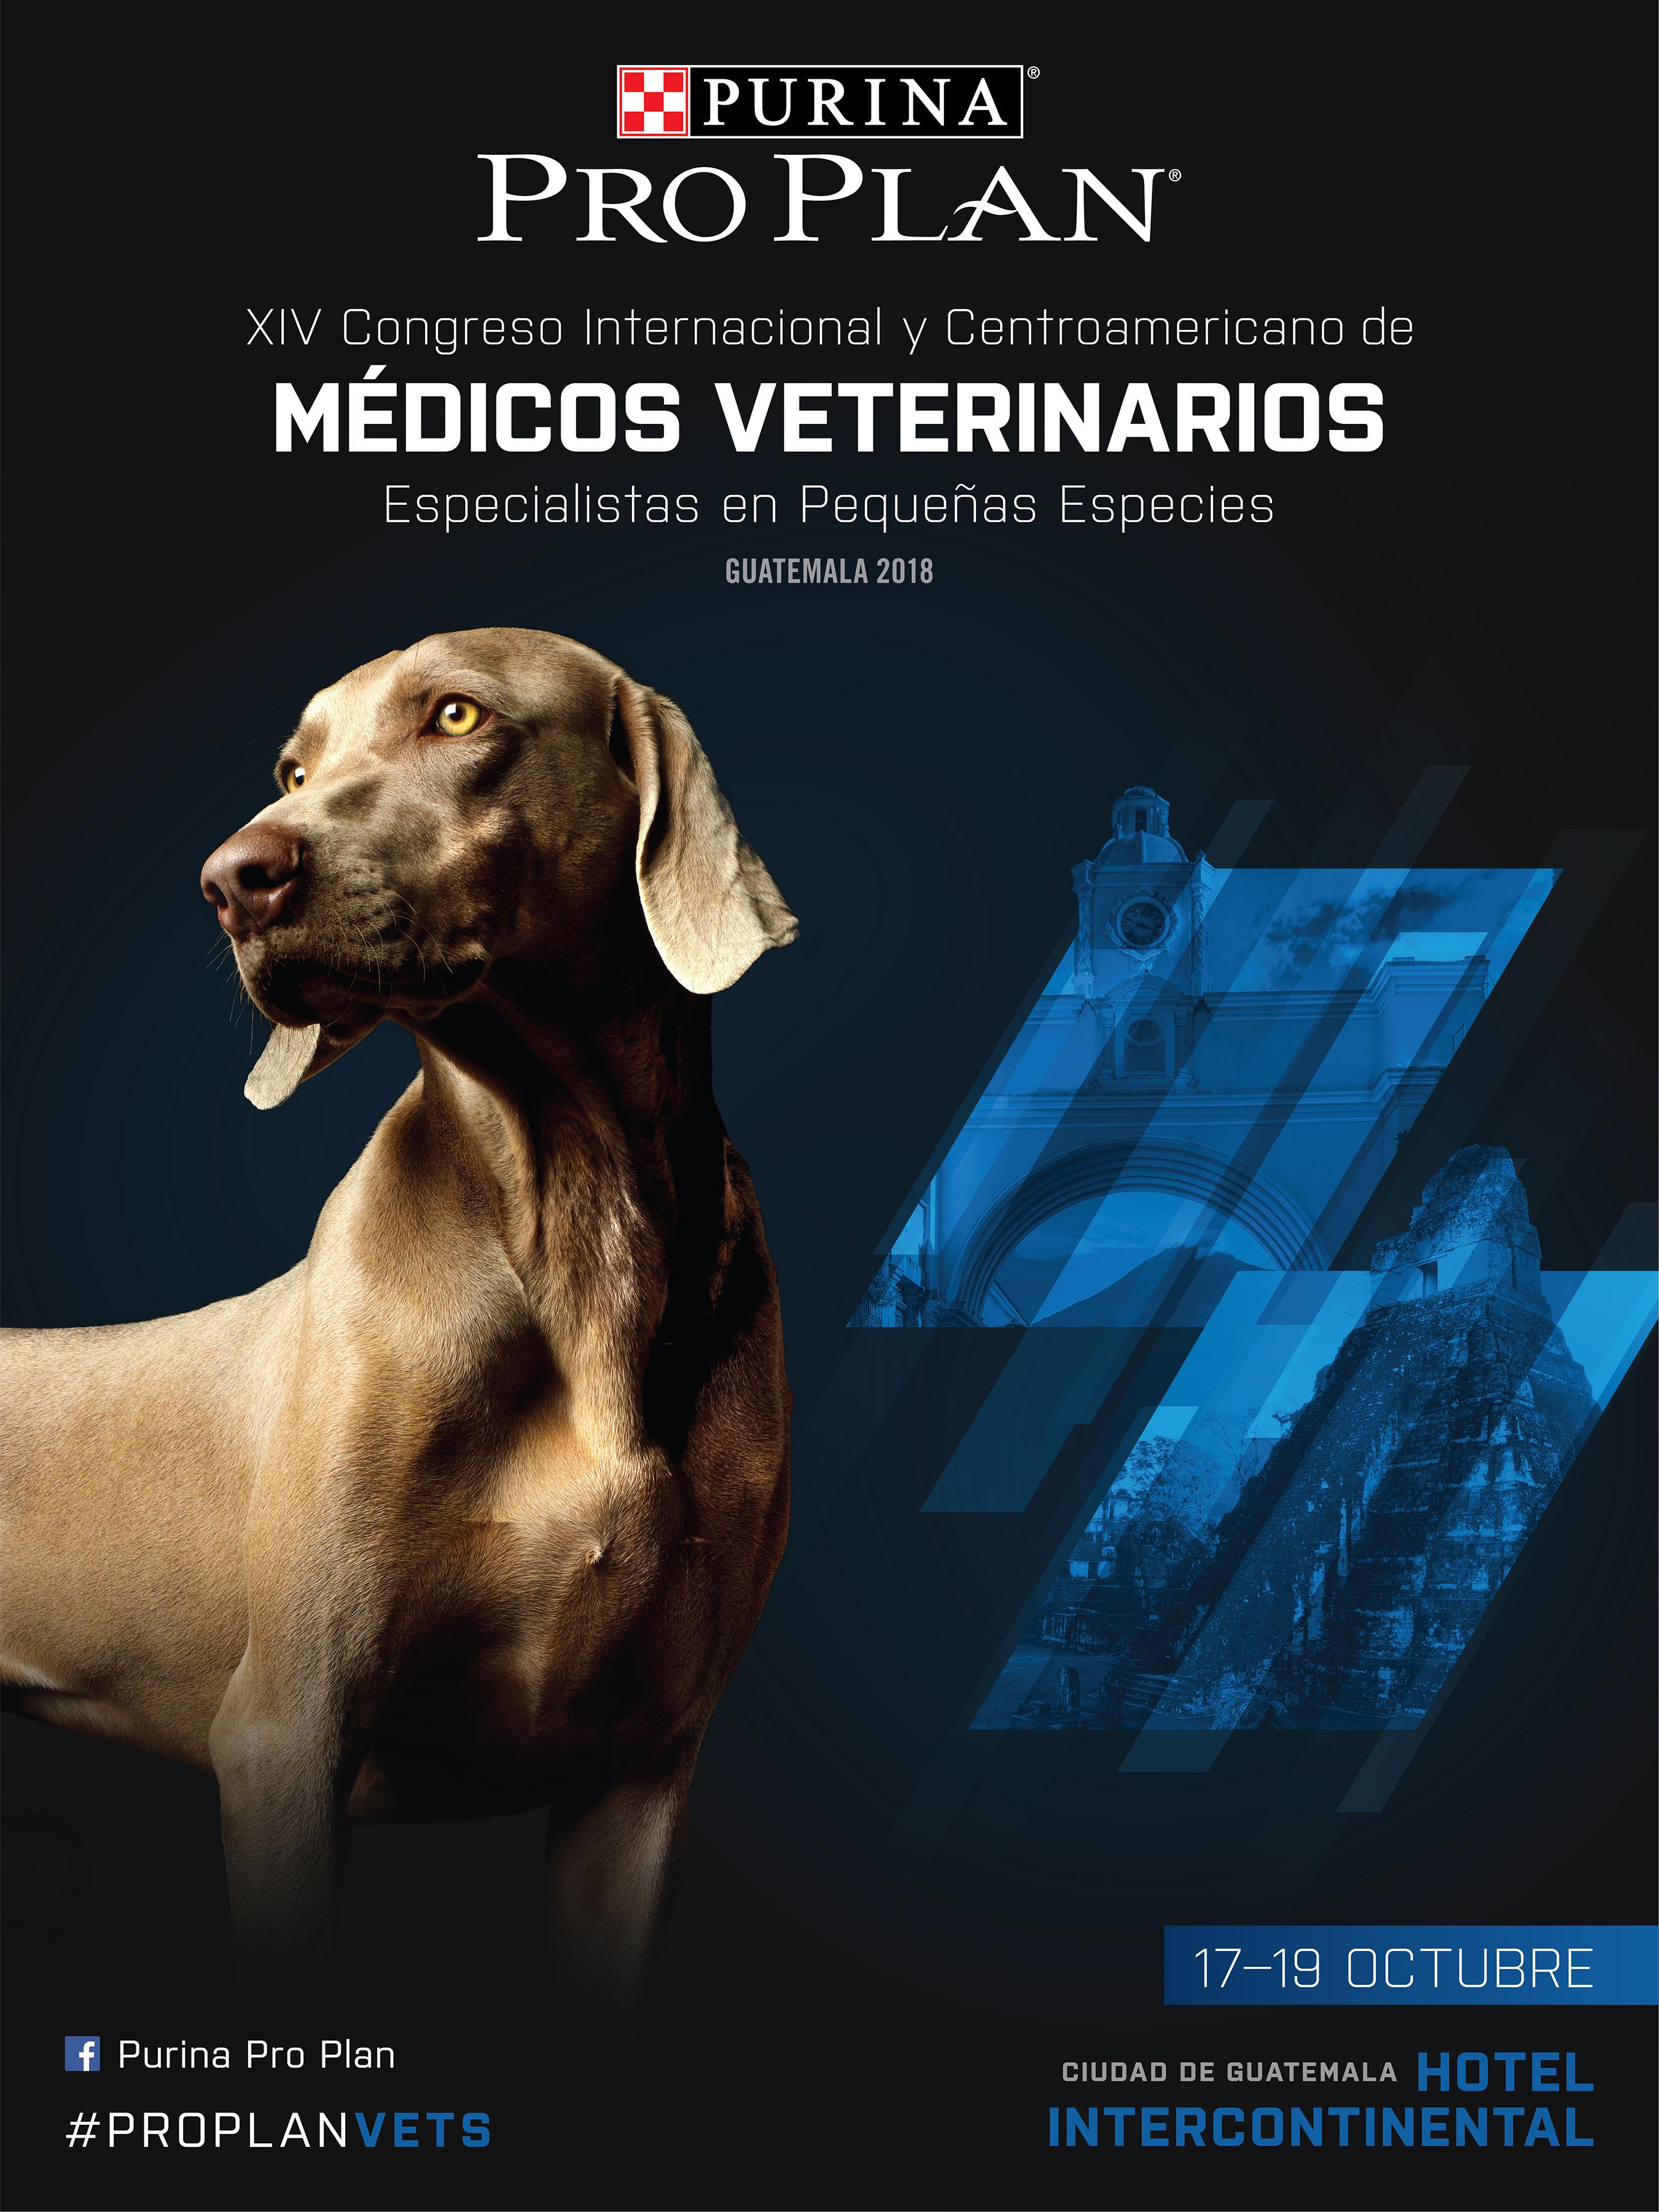 Purina Pro Plan /Médicos veterinarios